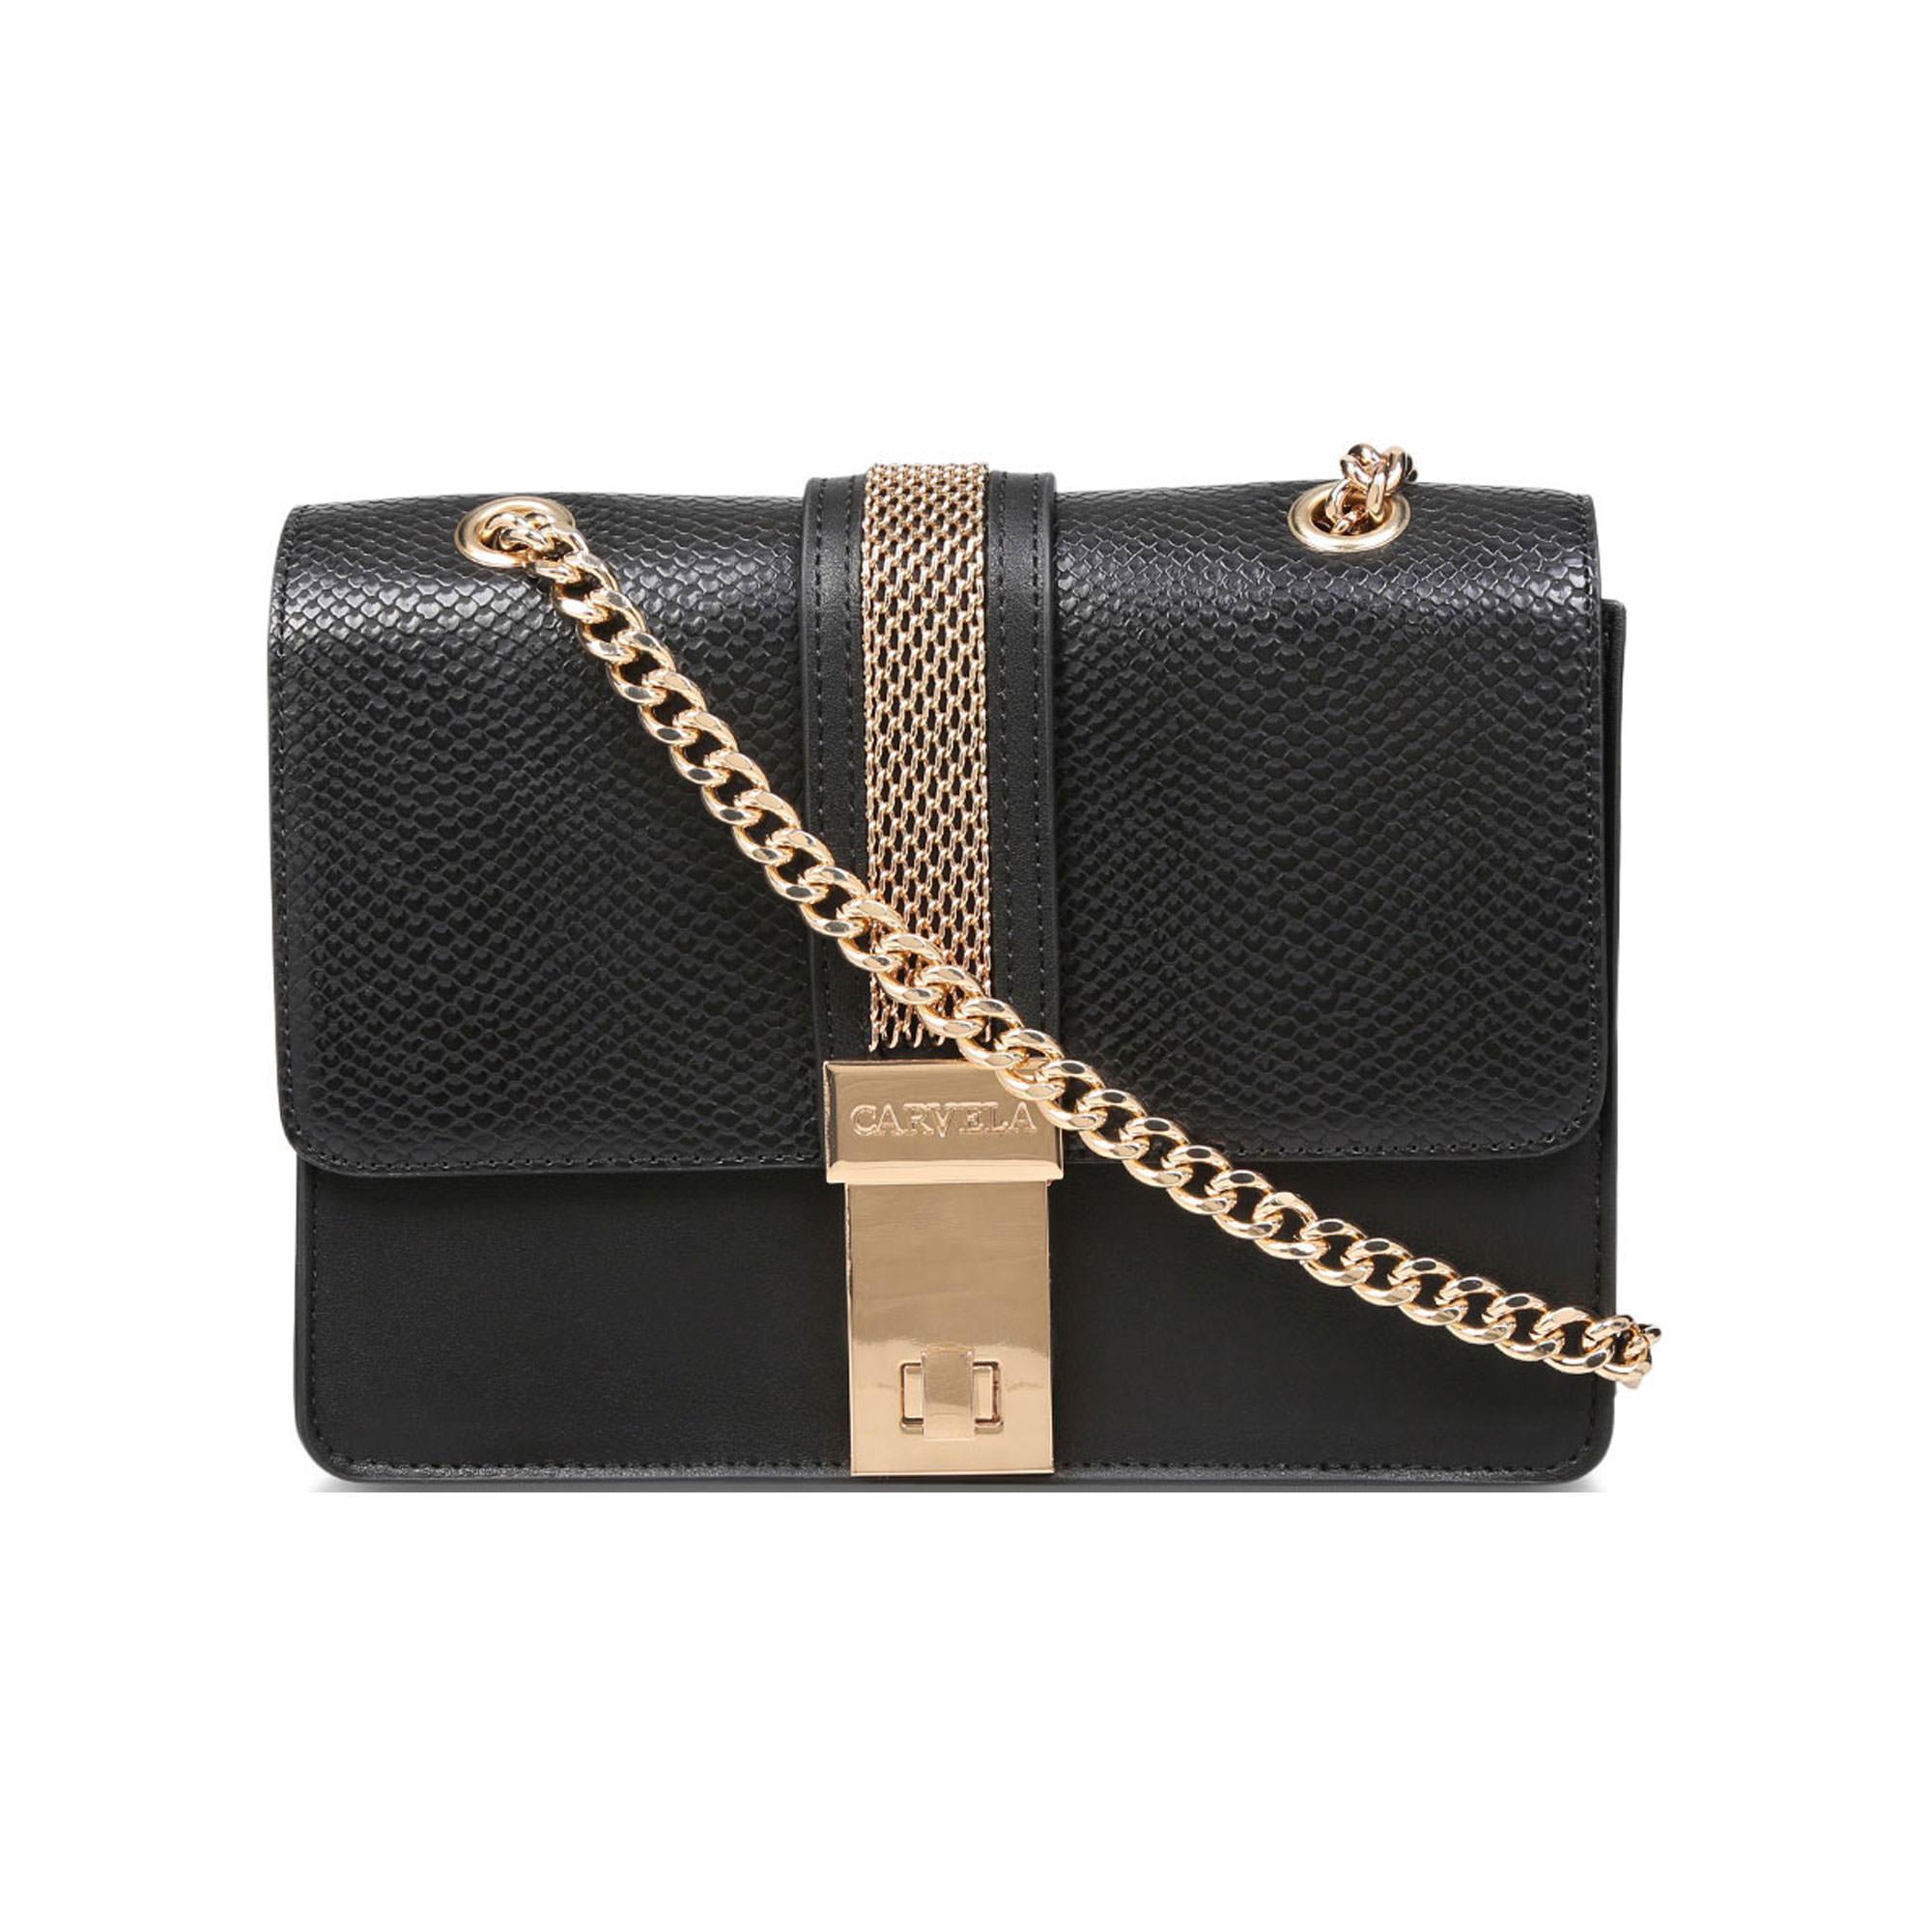 60002436600979BLACK: Casey Chain Cross Body Bag